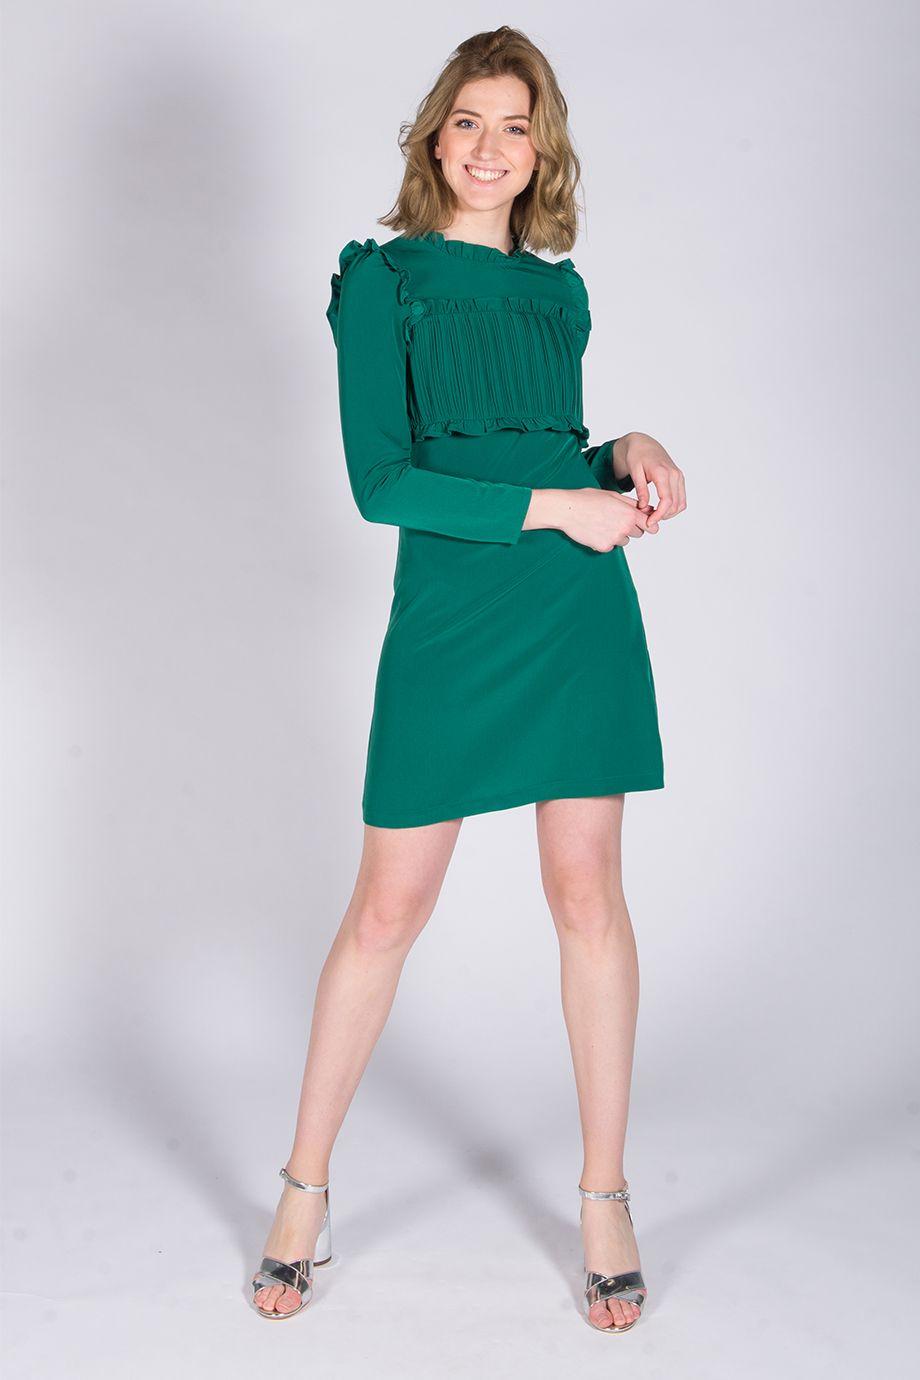 Robe verte buste plissé ROUMBA Maje manches longues à louer